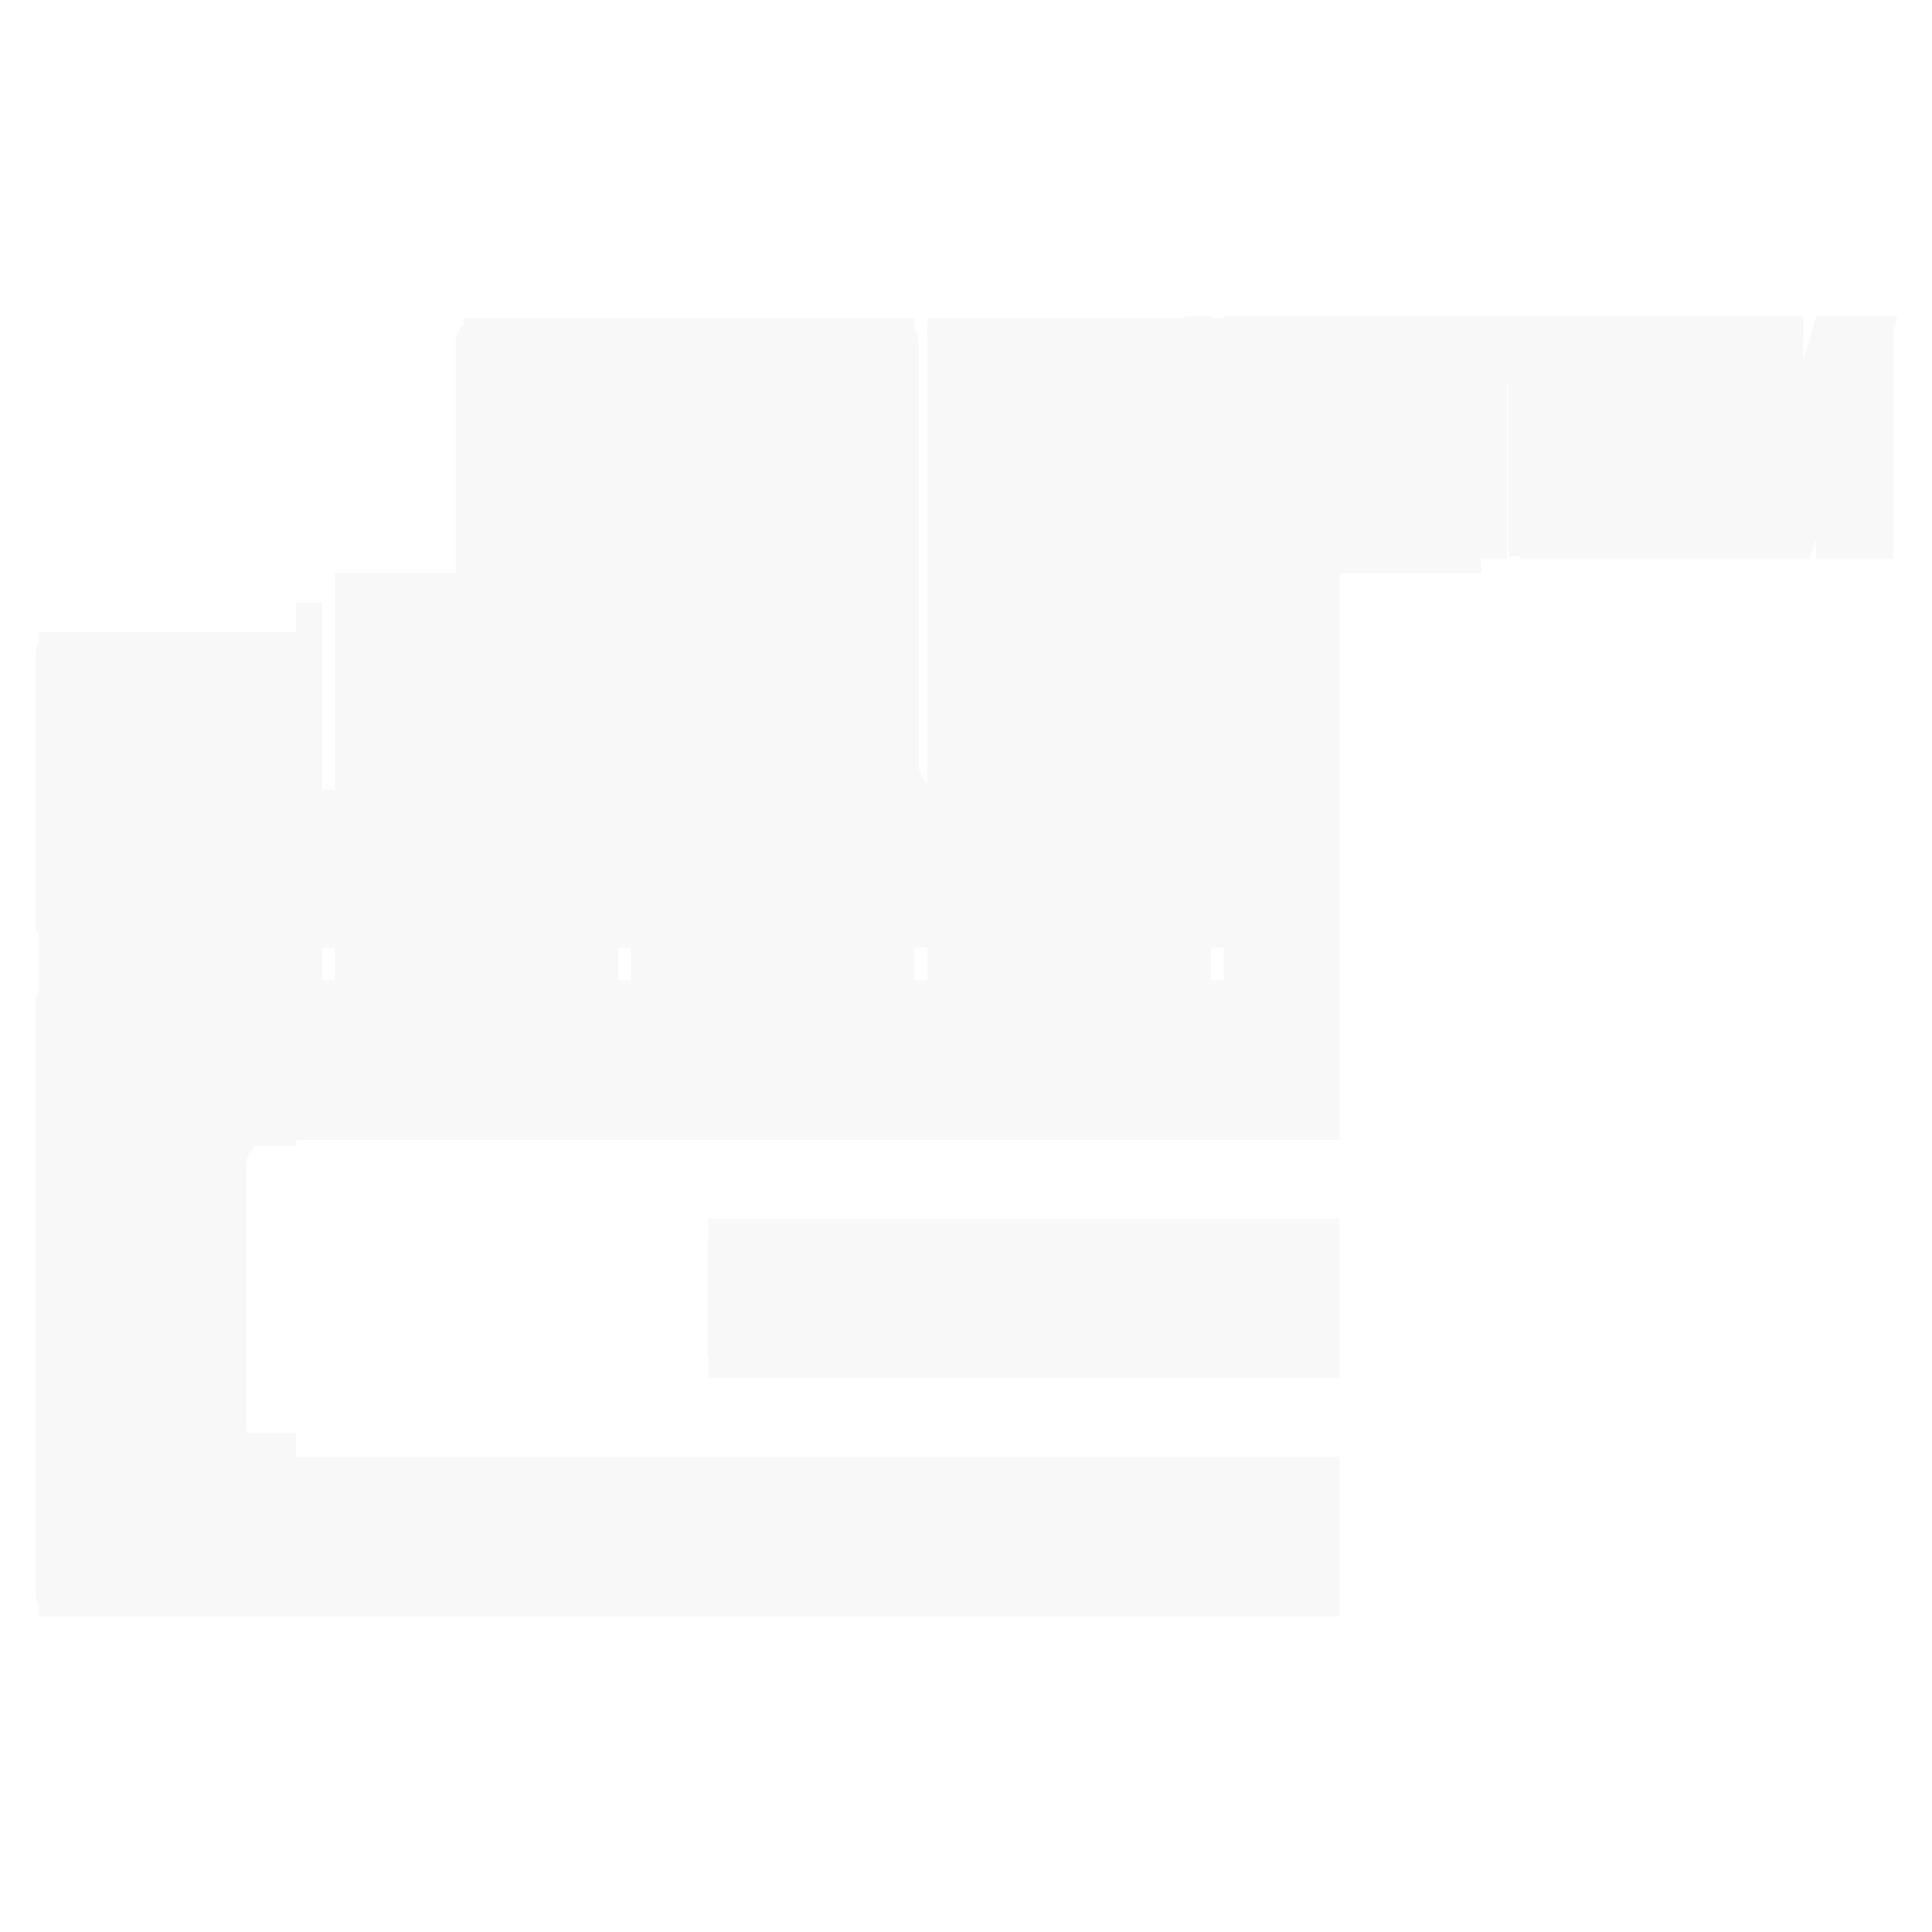 Tulsa ok 74187 tv guide todays tv schedule 173 malvernweather Choice Image